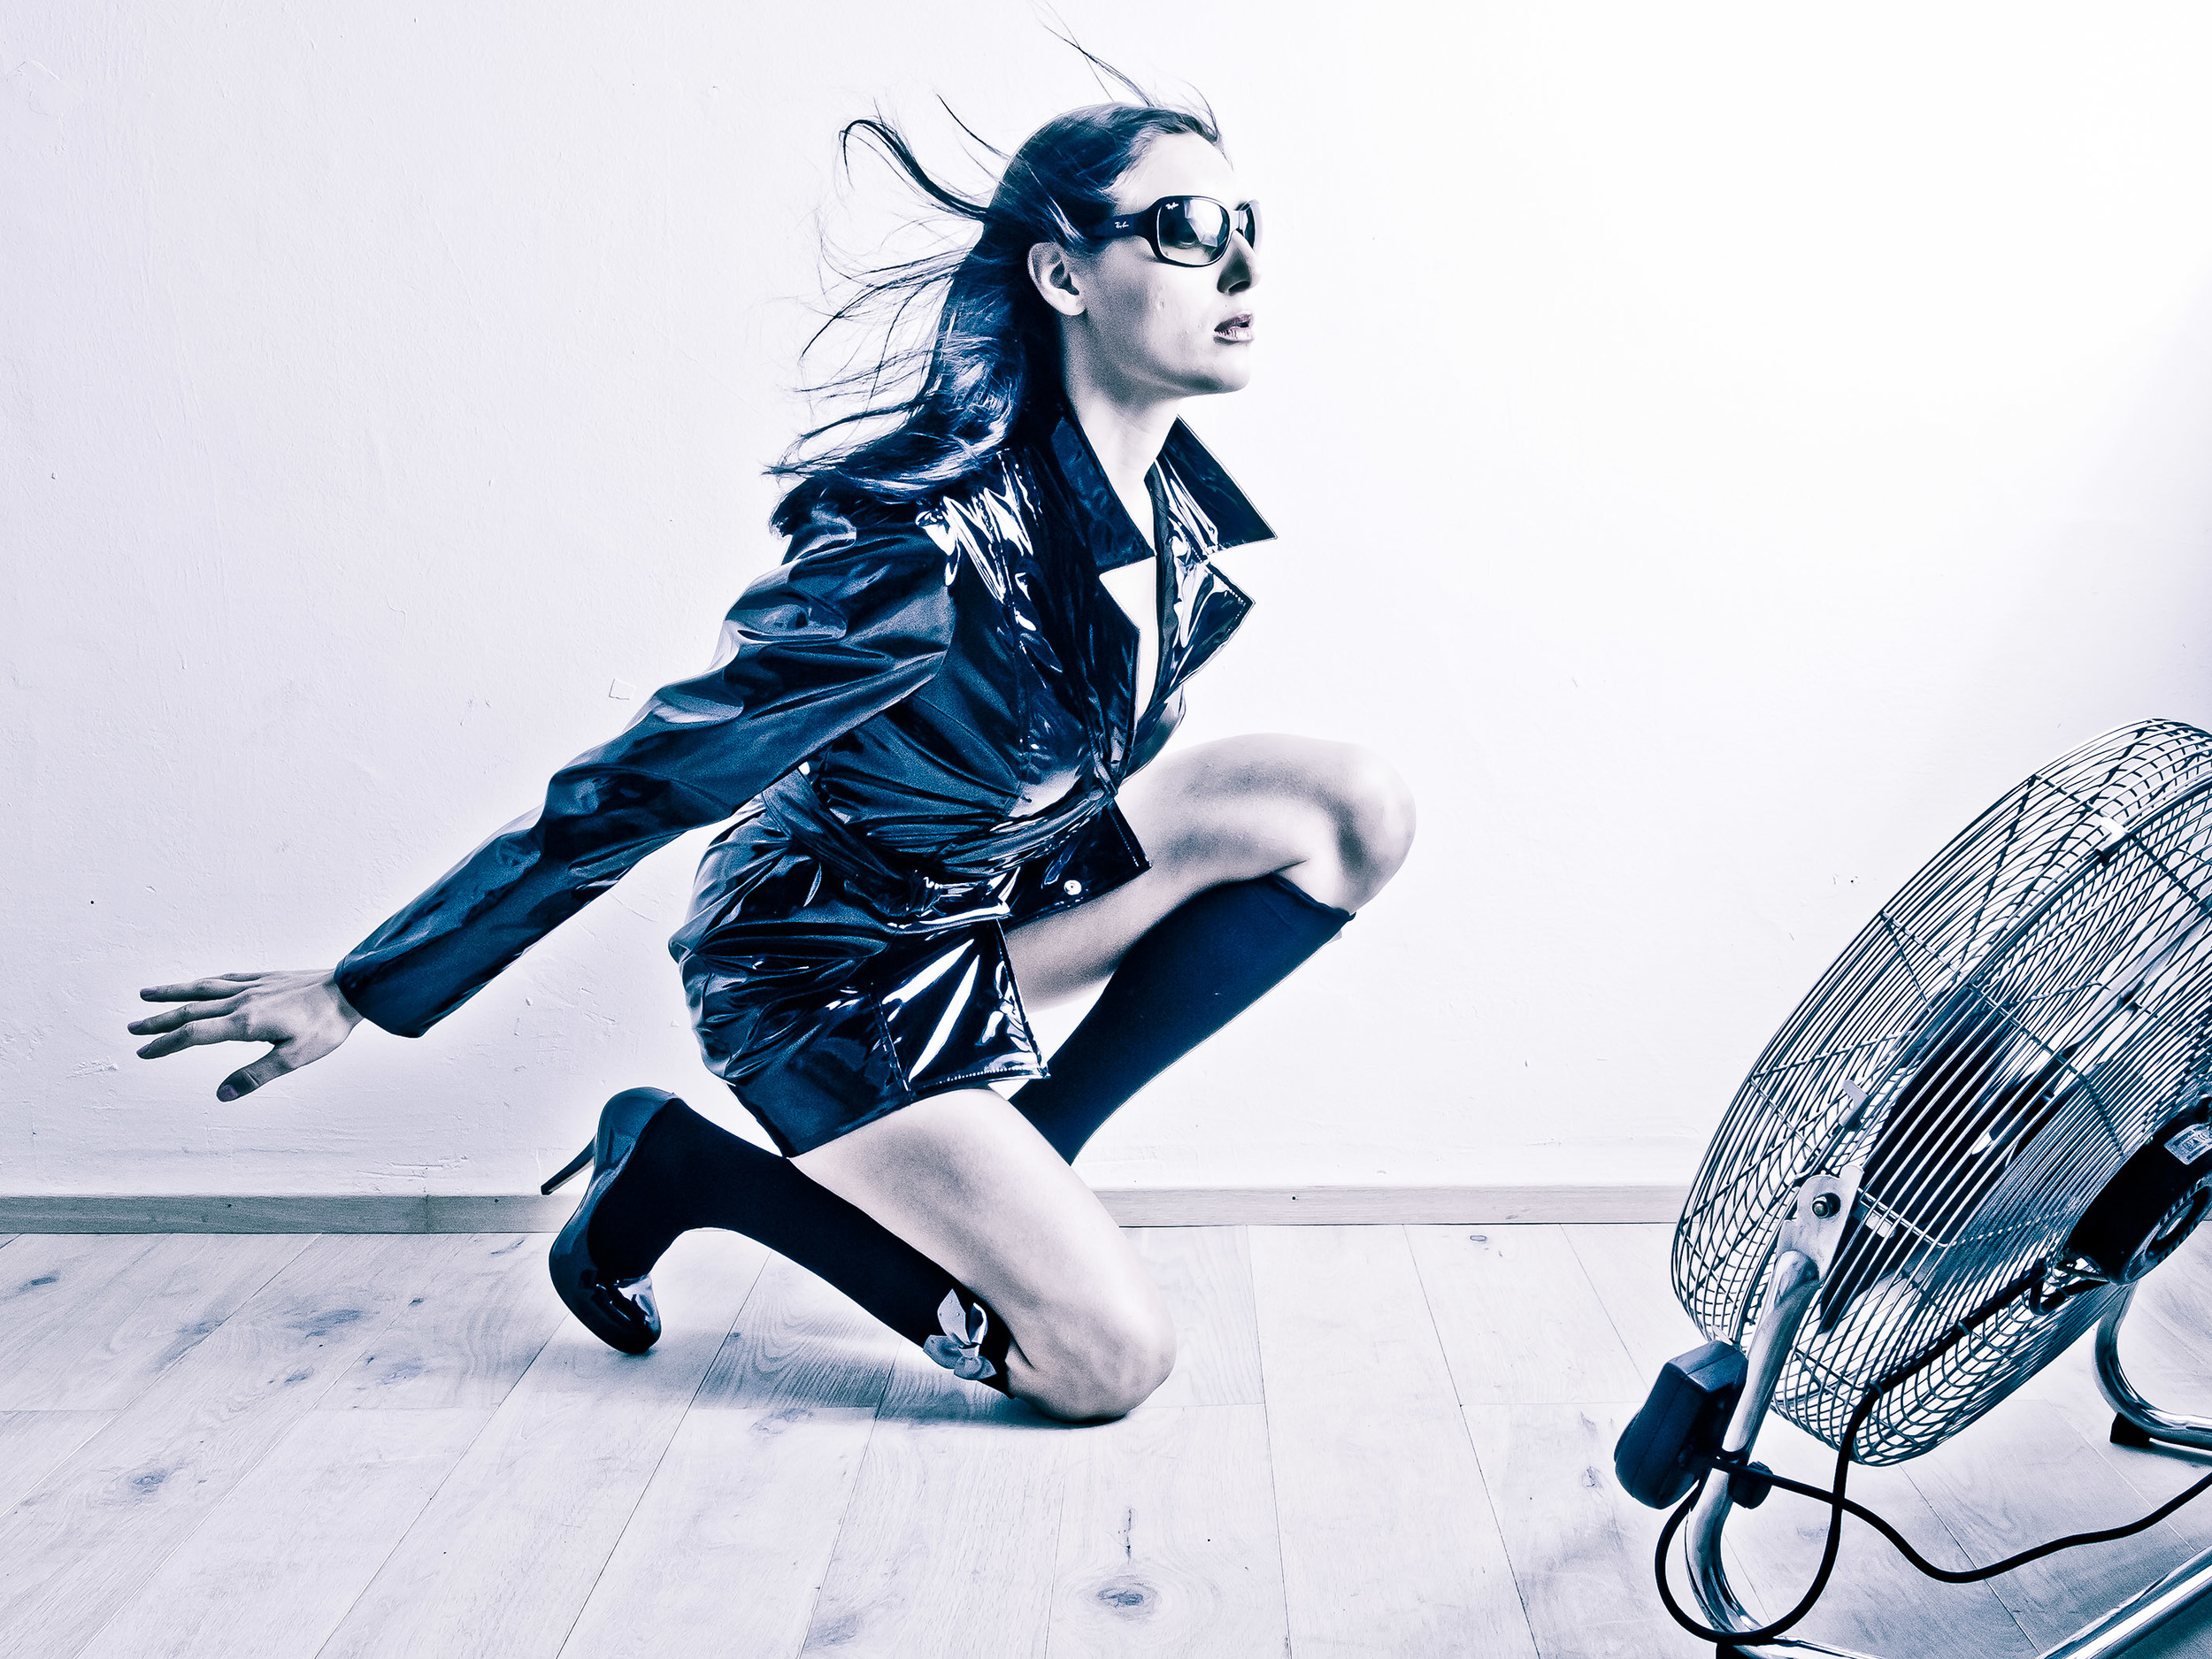 Foto by art+fashion - www.fotocult.at